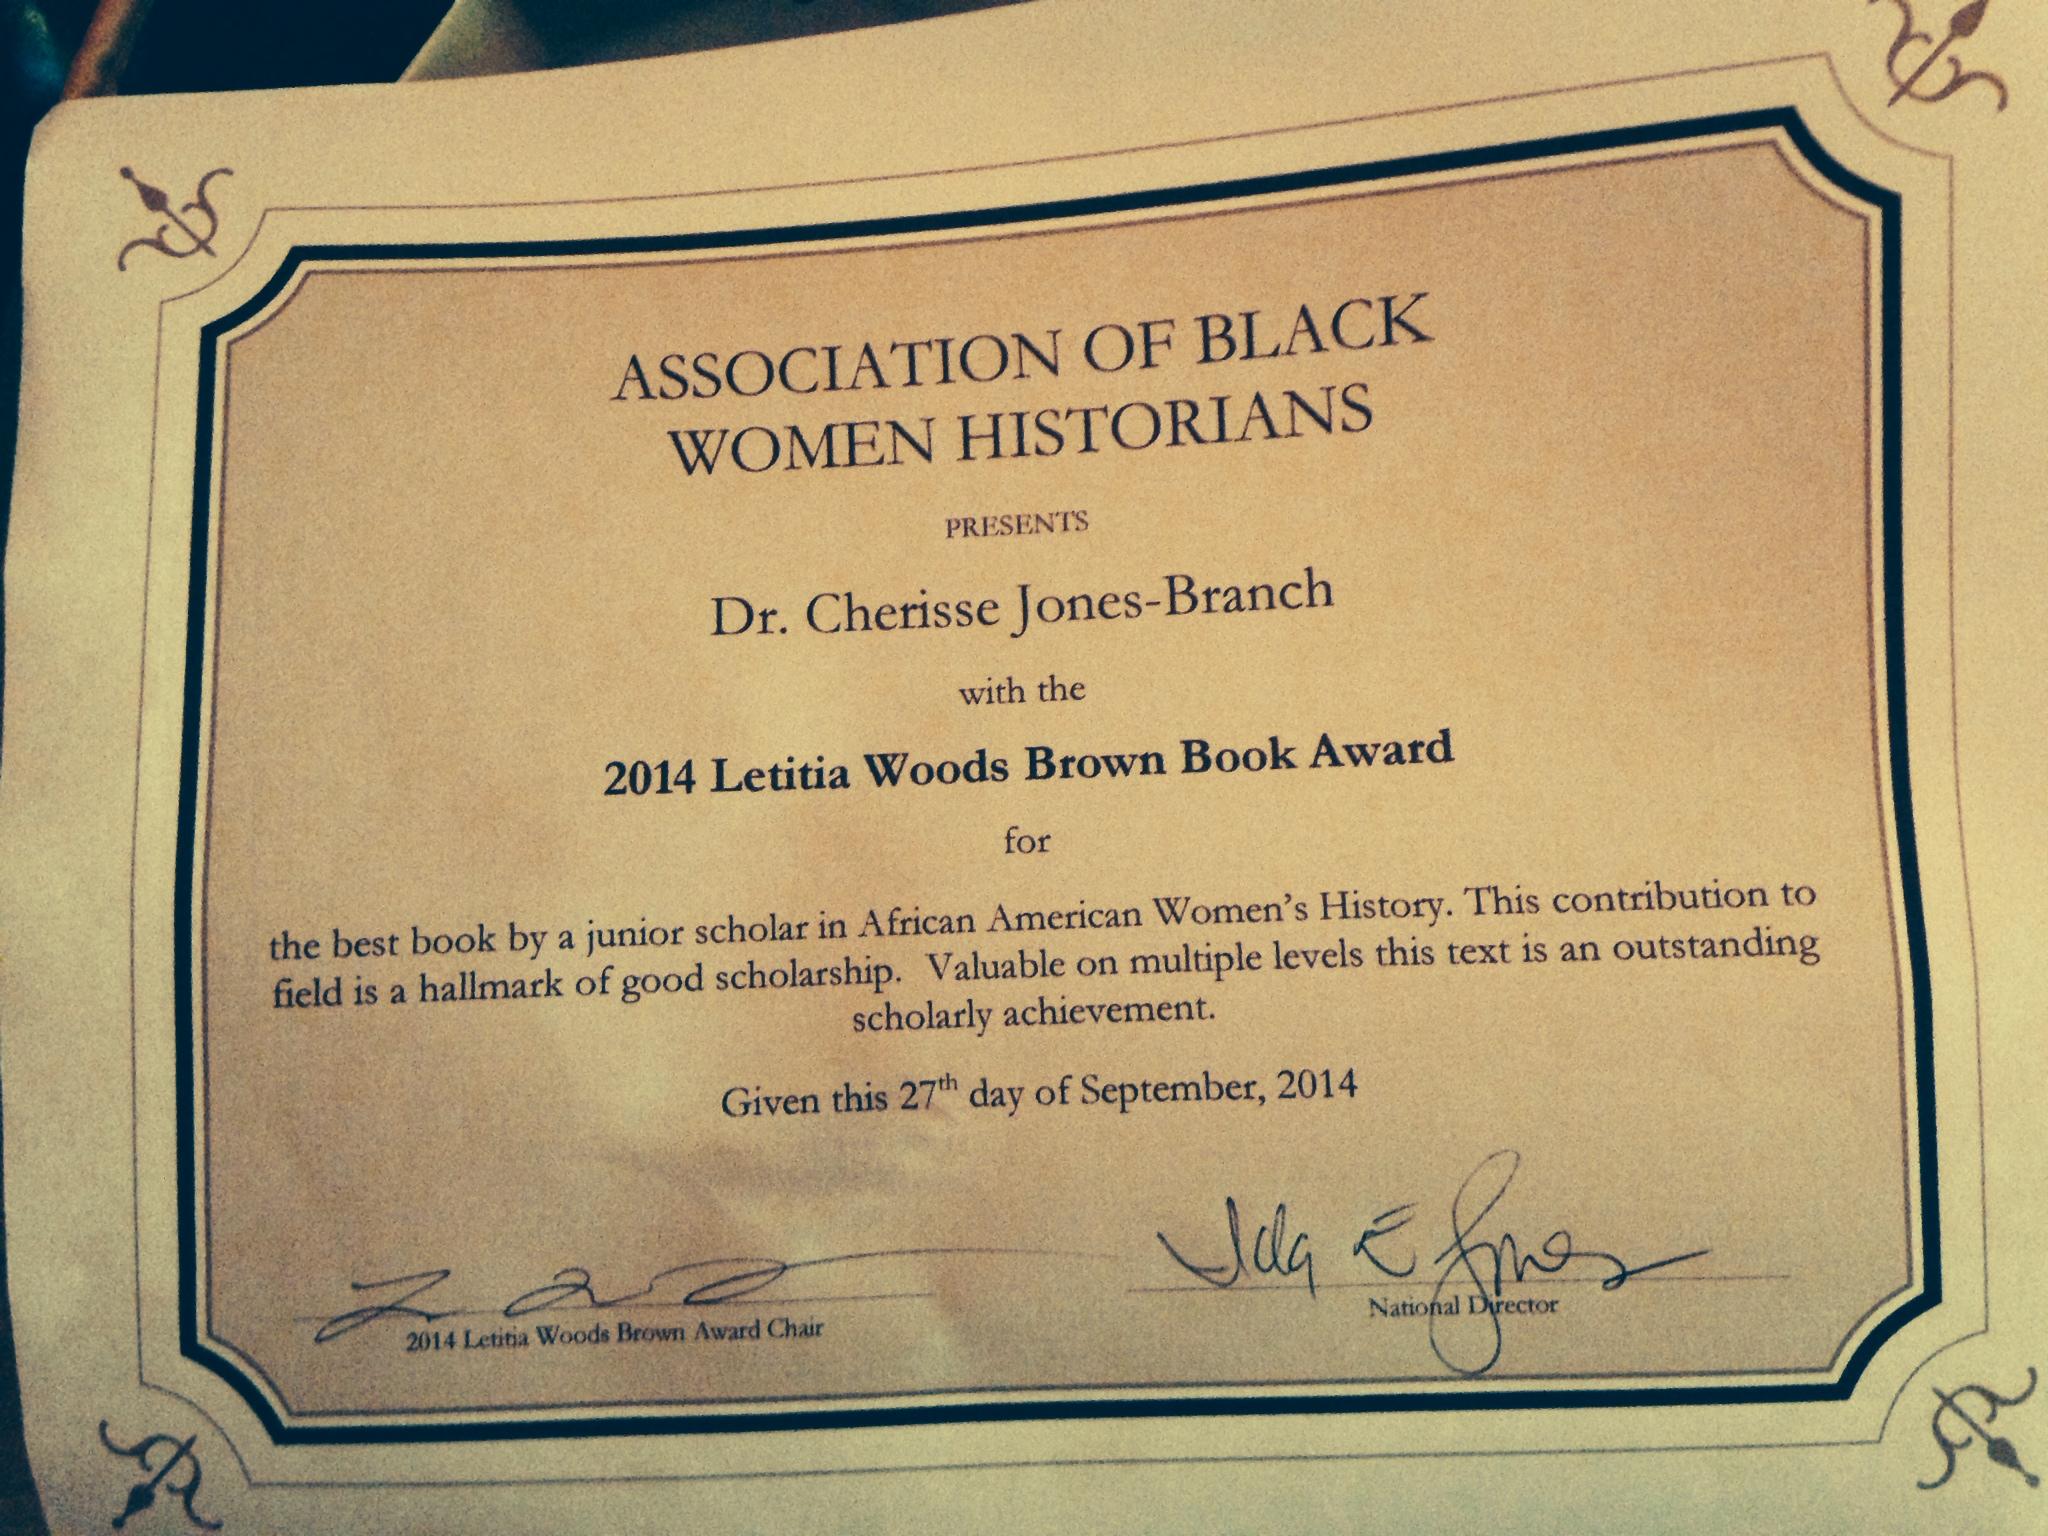 Association of Black Women Historians Letitia Woods Brown Book Award